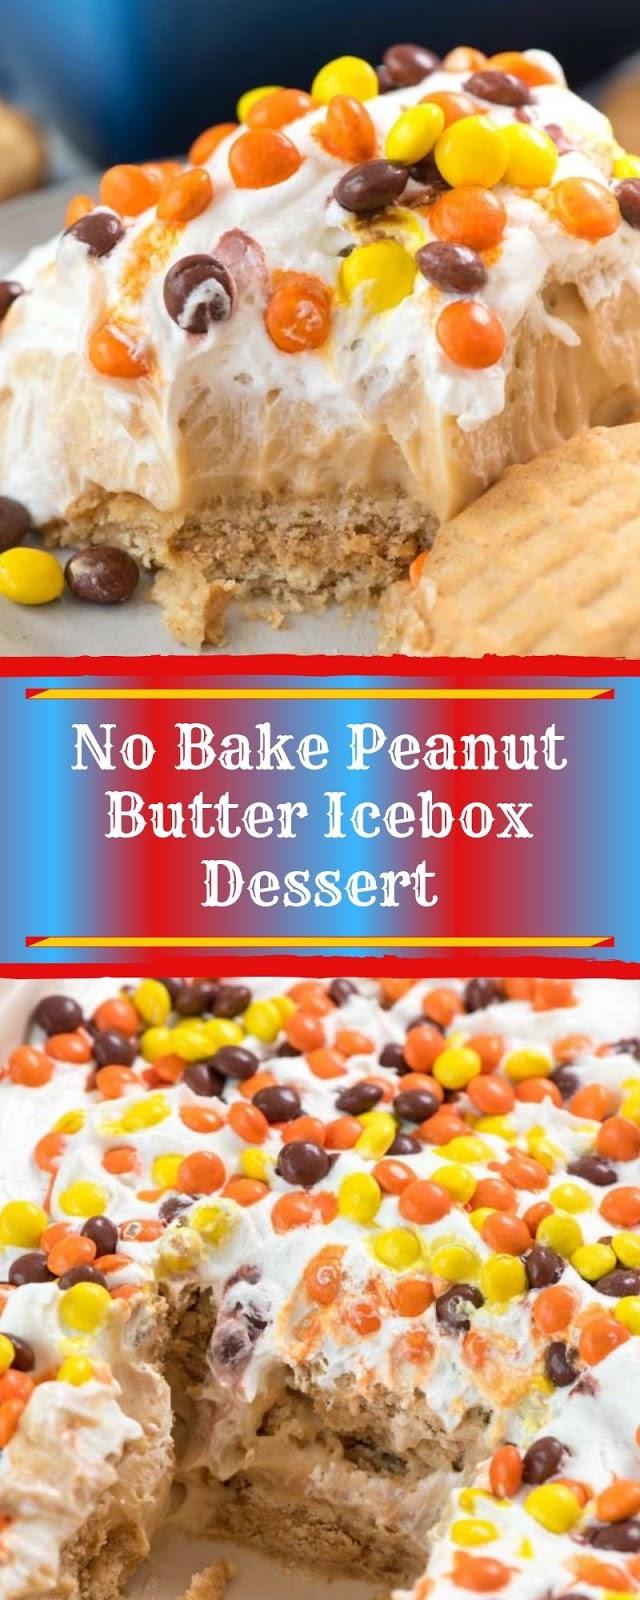 No Bake Peanut Butter Icebox Dessert